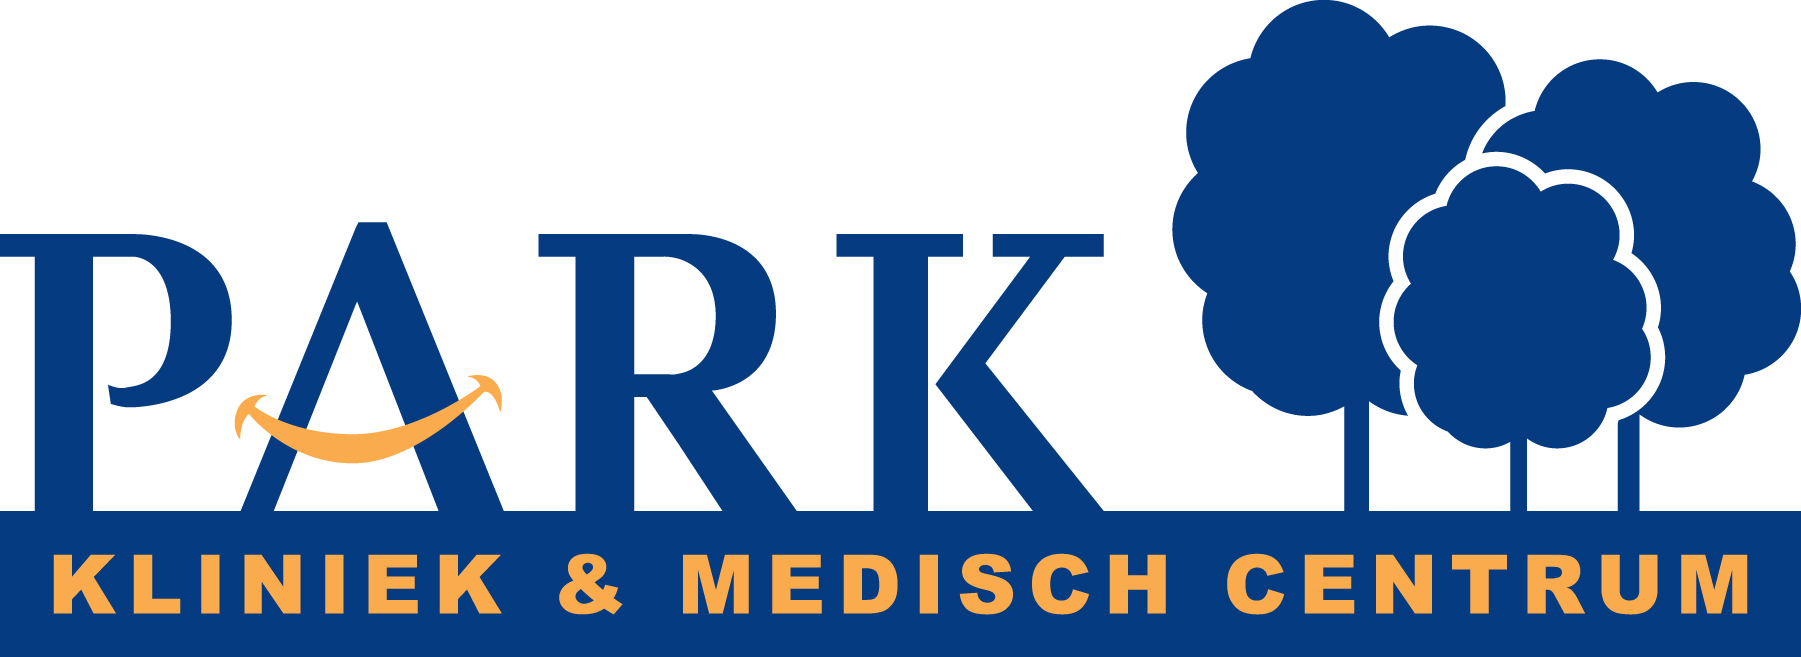 Parkkliniek – Park Medisch Centrum Rotterdam